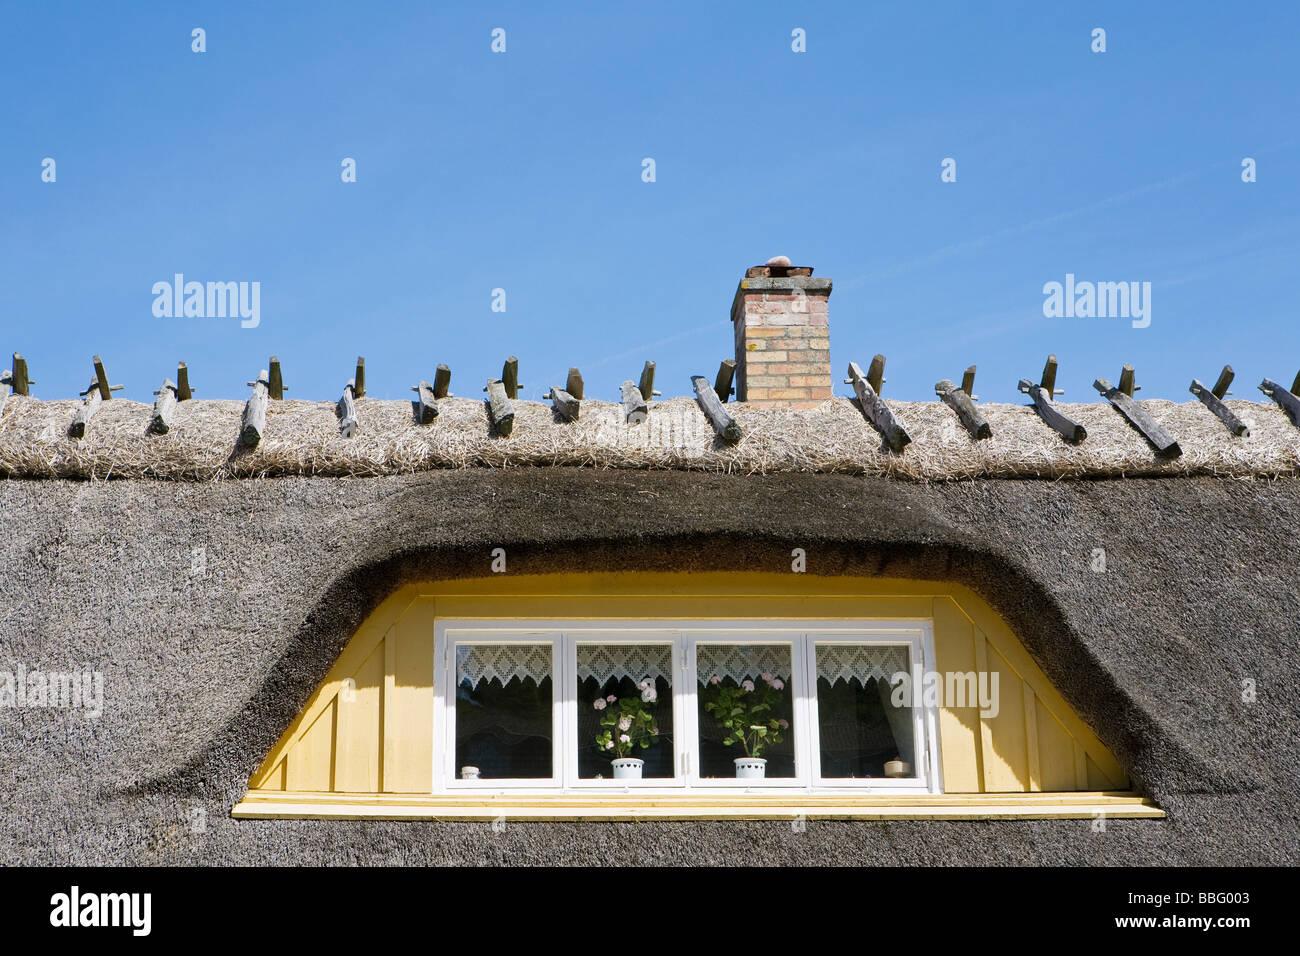 Thatched Dach eines Hauses Stockbild